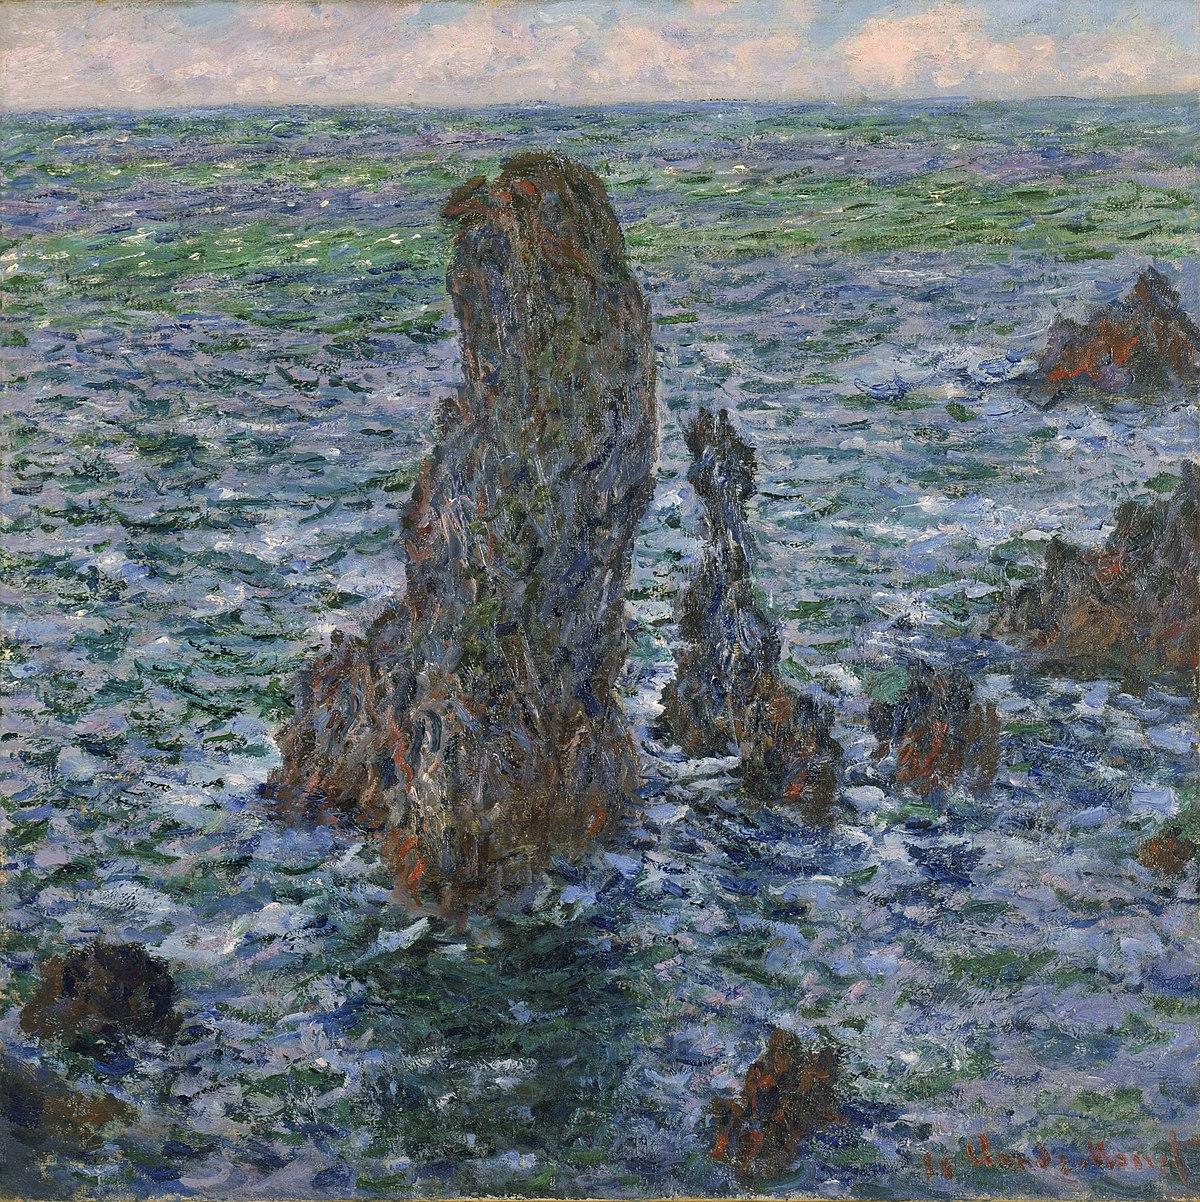 Fájl:Claude Monet Pyramides Port Coton.jpg – Wikipédia